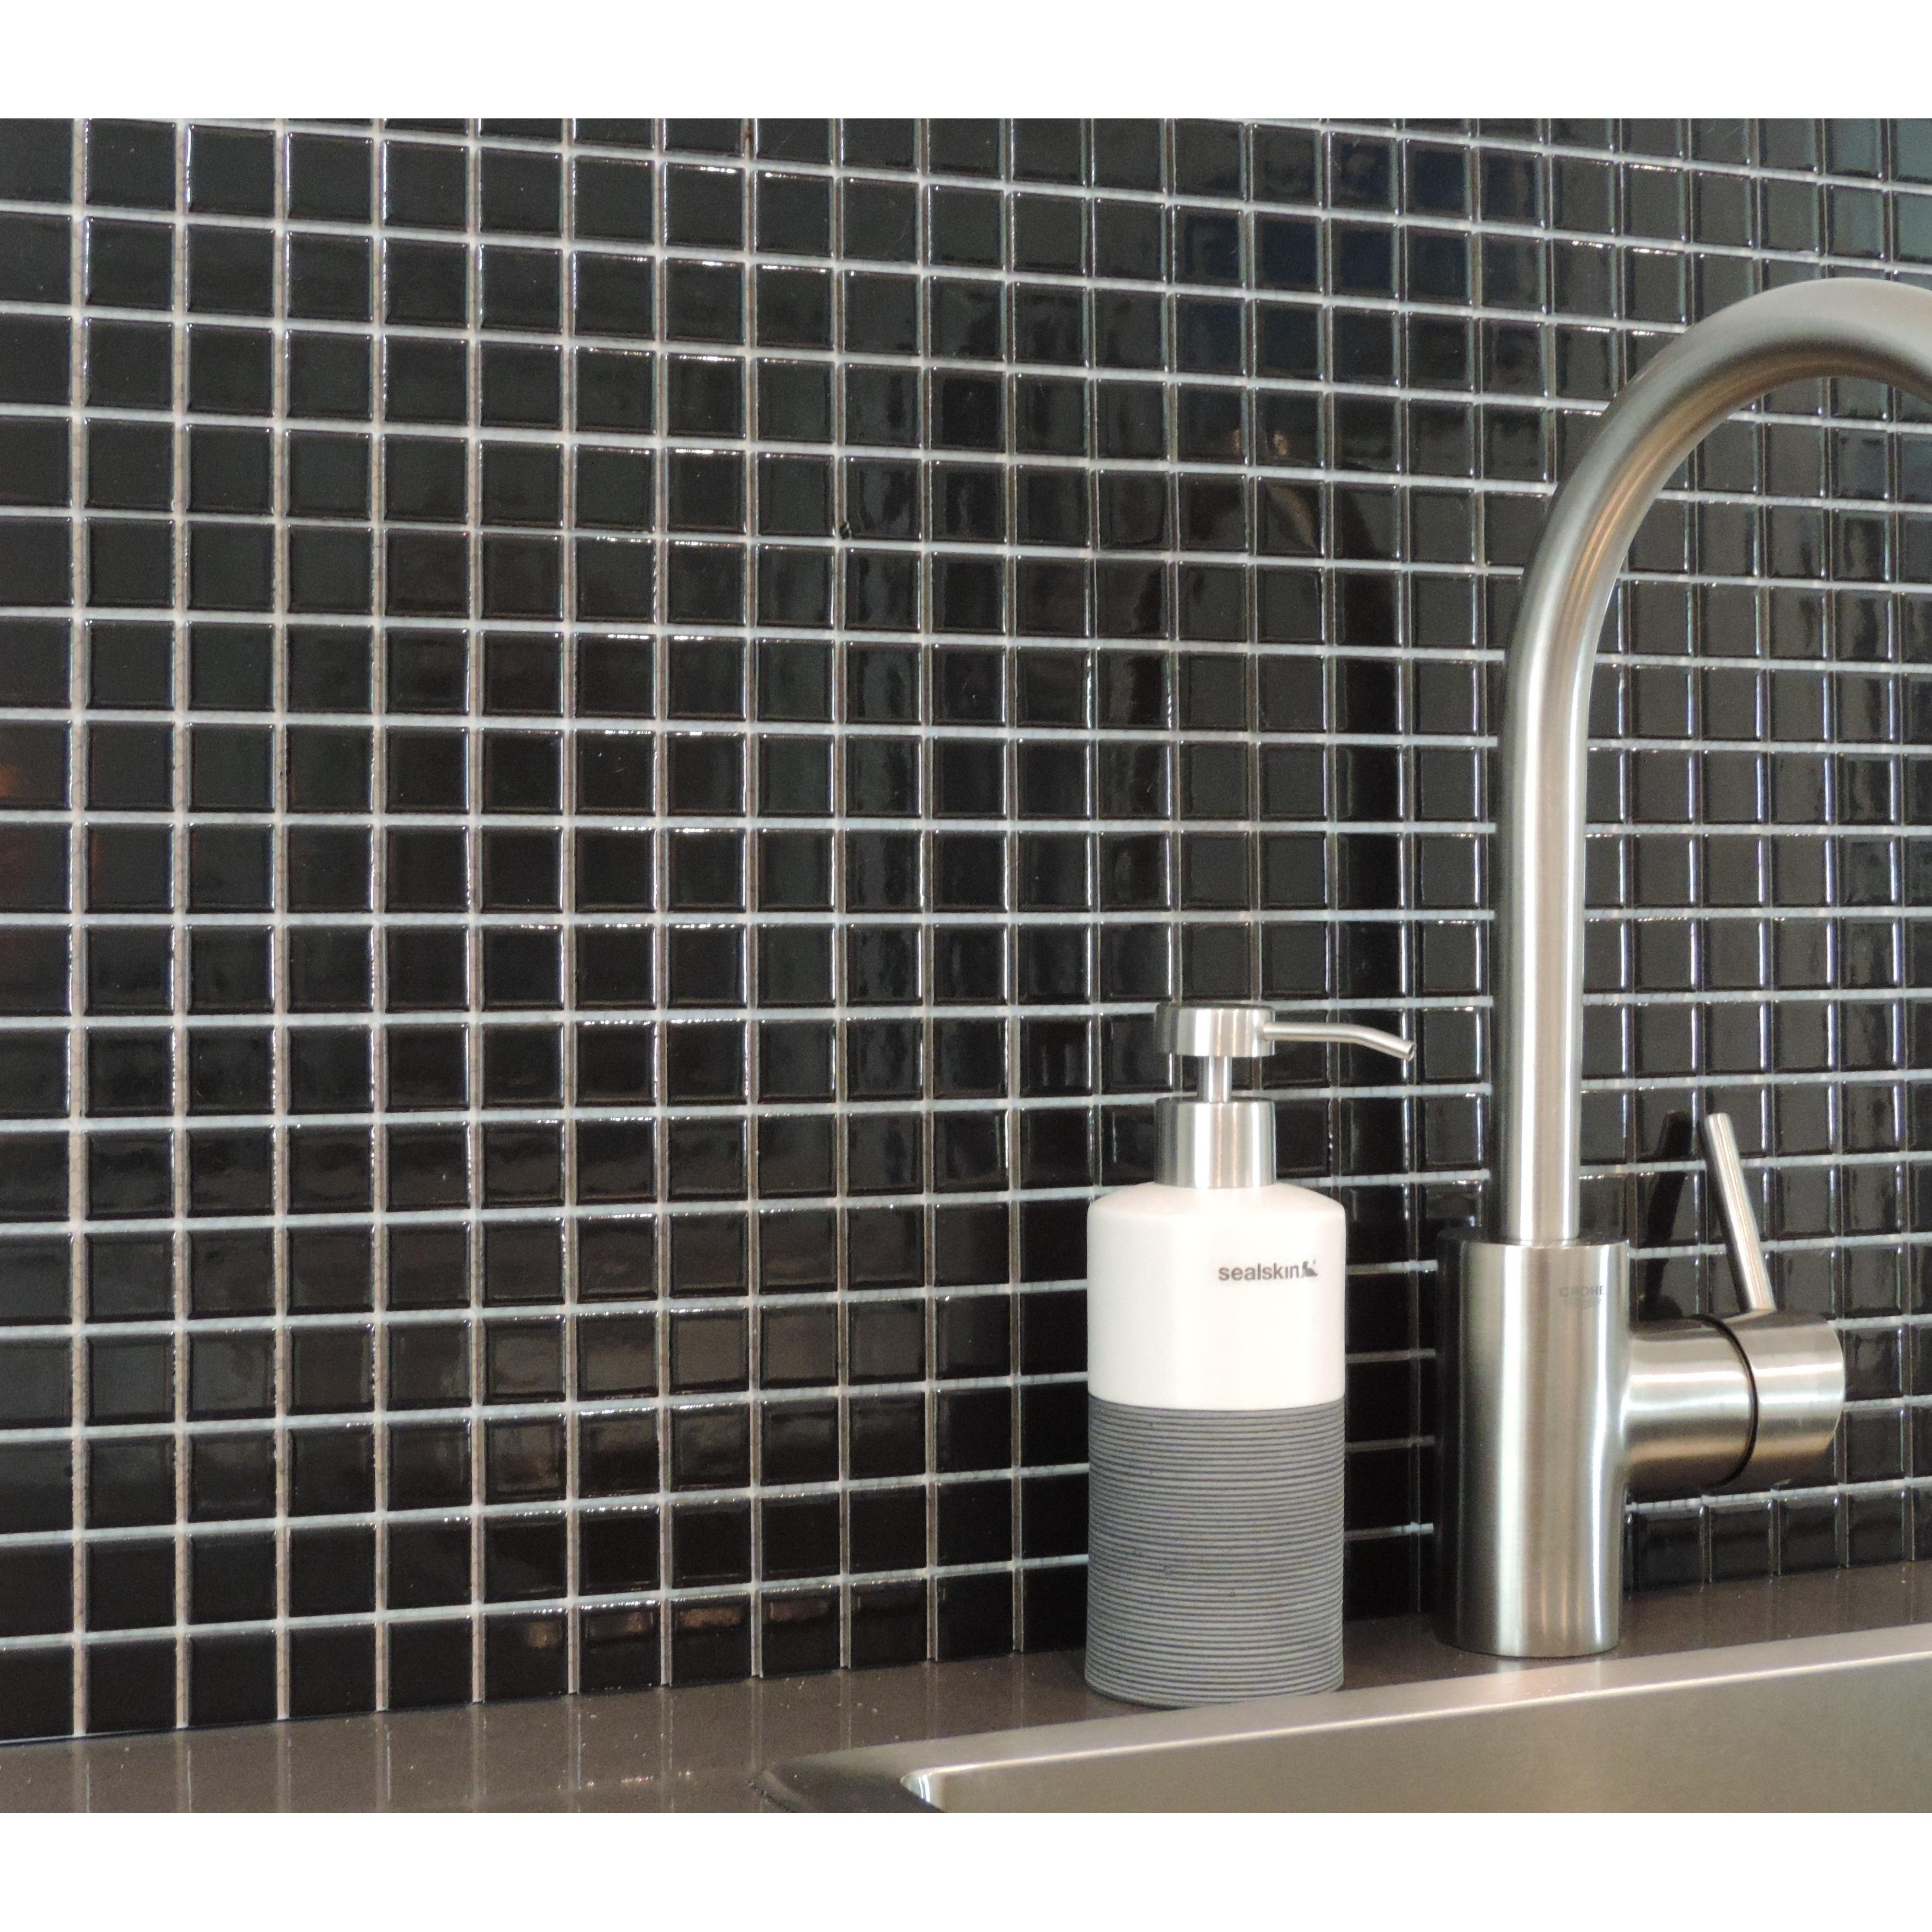 Porcelain Premium Quality 2x2 Black Square Matte Mosaic Tile Box of 5 Pcs Great For Bathroom Tile Wall Tile and Kitchen Backsplash Tiles on 12x12 Sheet - Free Shipping Floor Tile